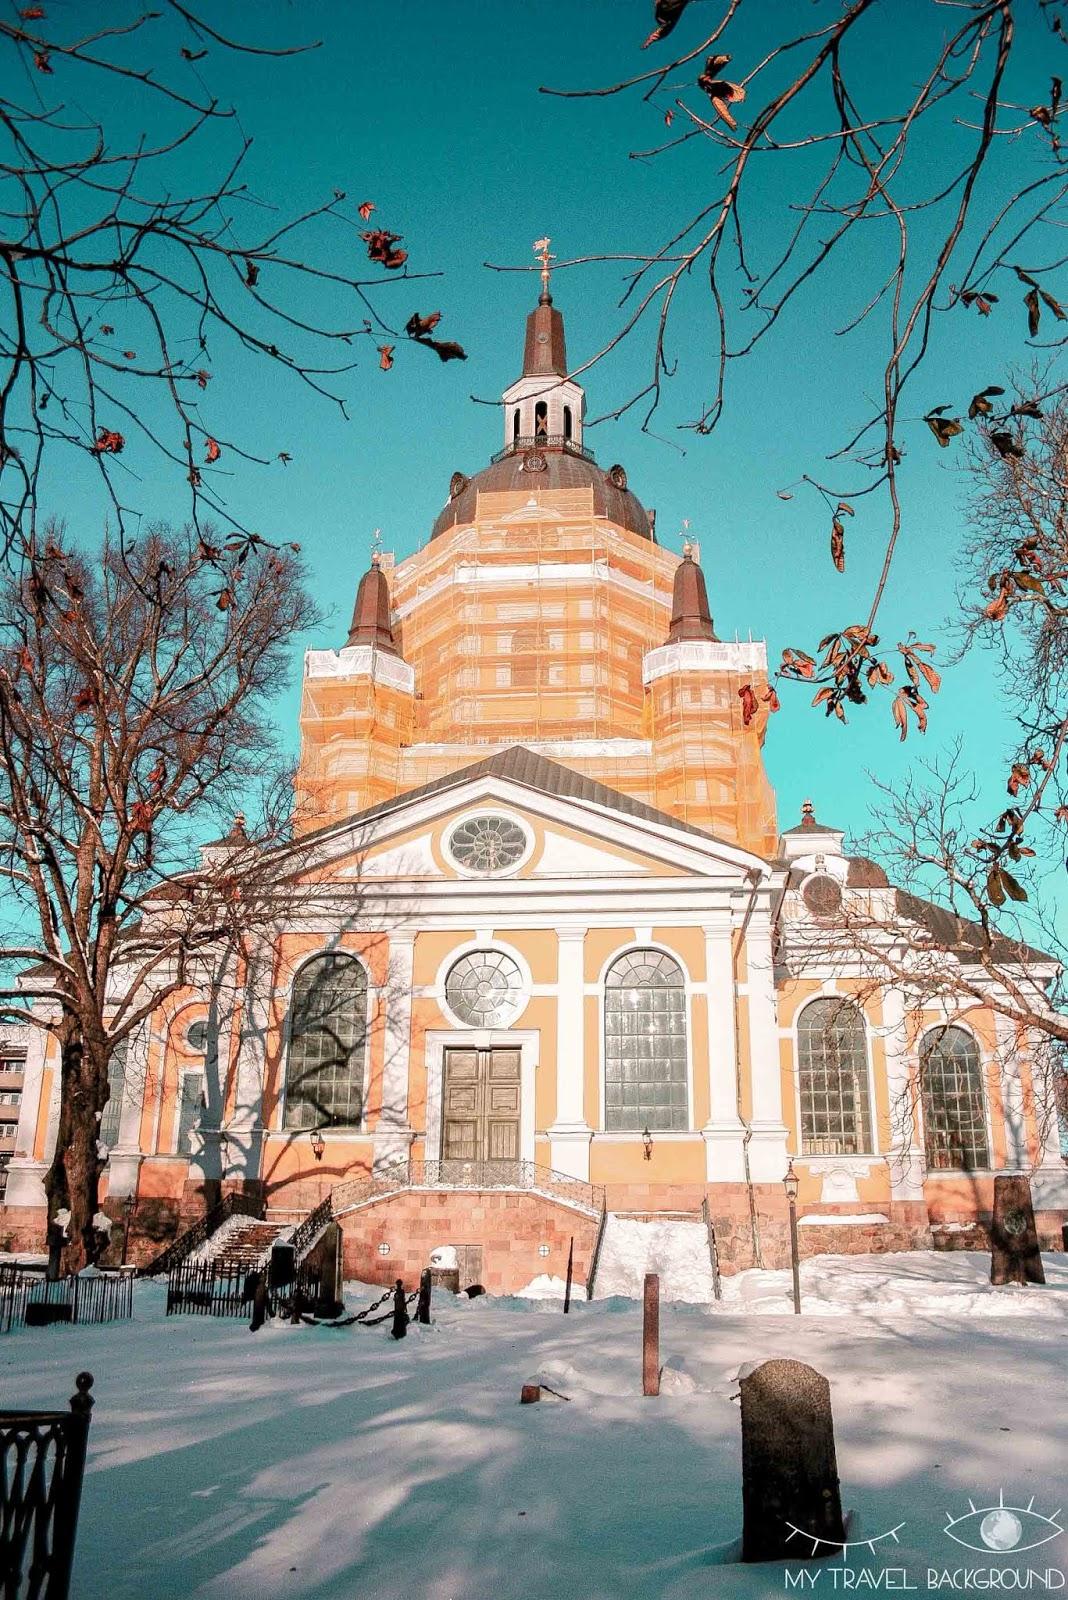 My Travel Background : Visiter Stockholm, mes immanquables - Eglise Katarina